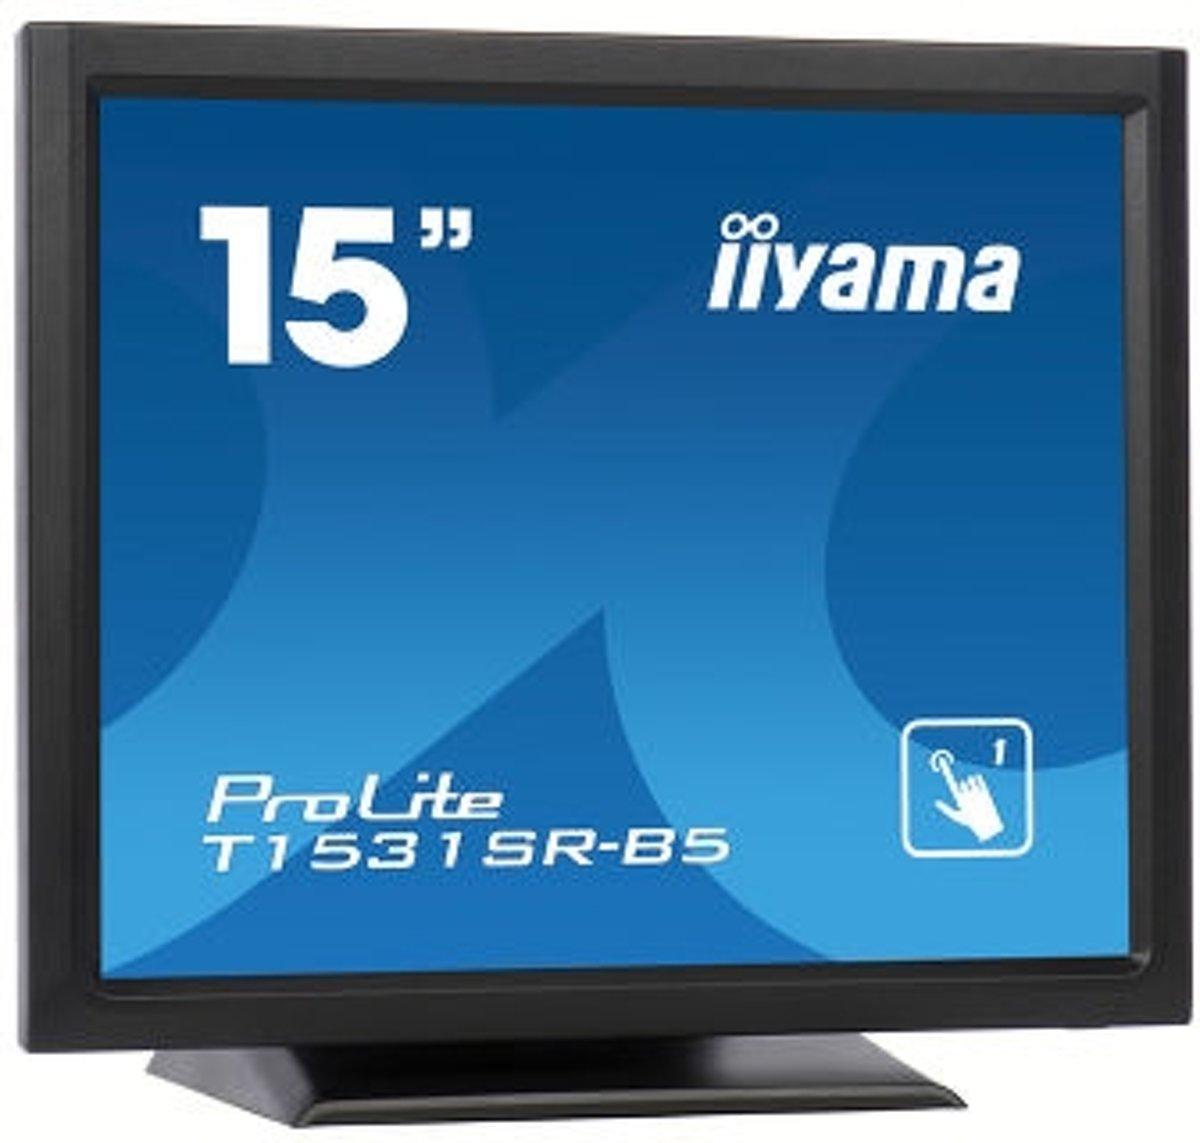 iiyama ProLite T1531SR-B5 15'' 1024 x 768Pixels Zwart touch screen-monitor